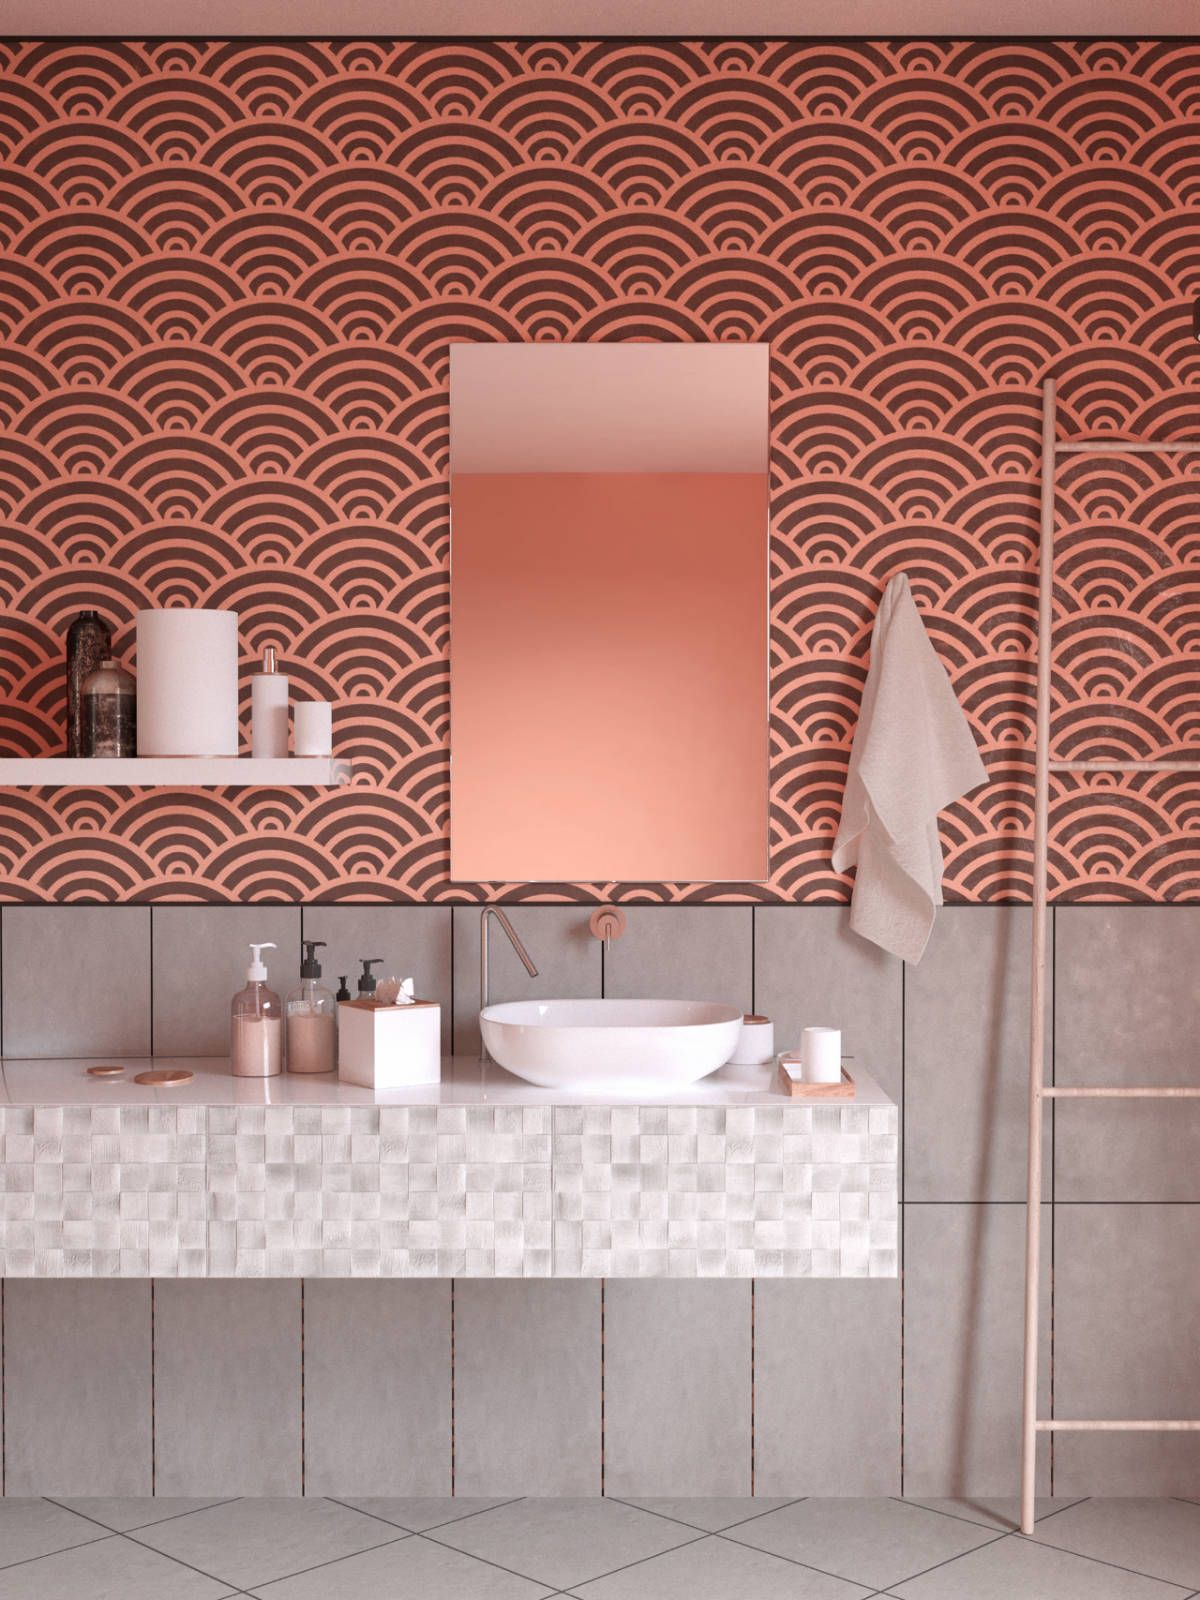 We had pink plastic tiles in parent's 1st house, bulit ...